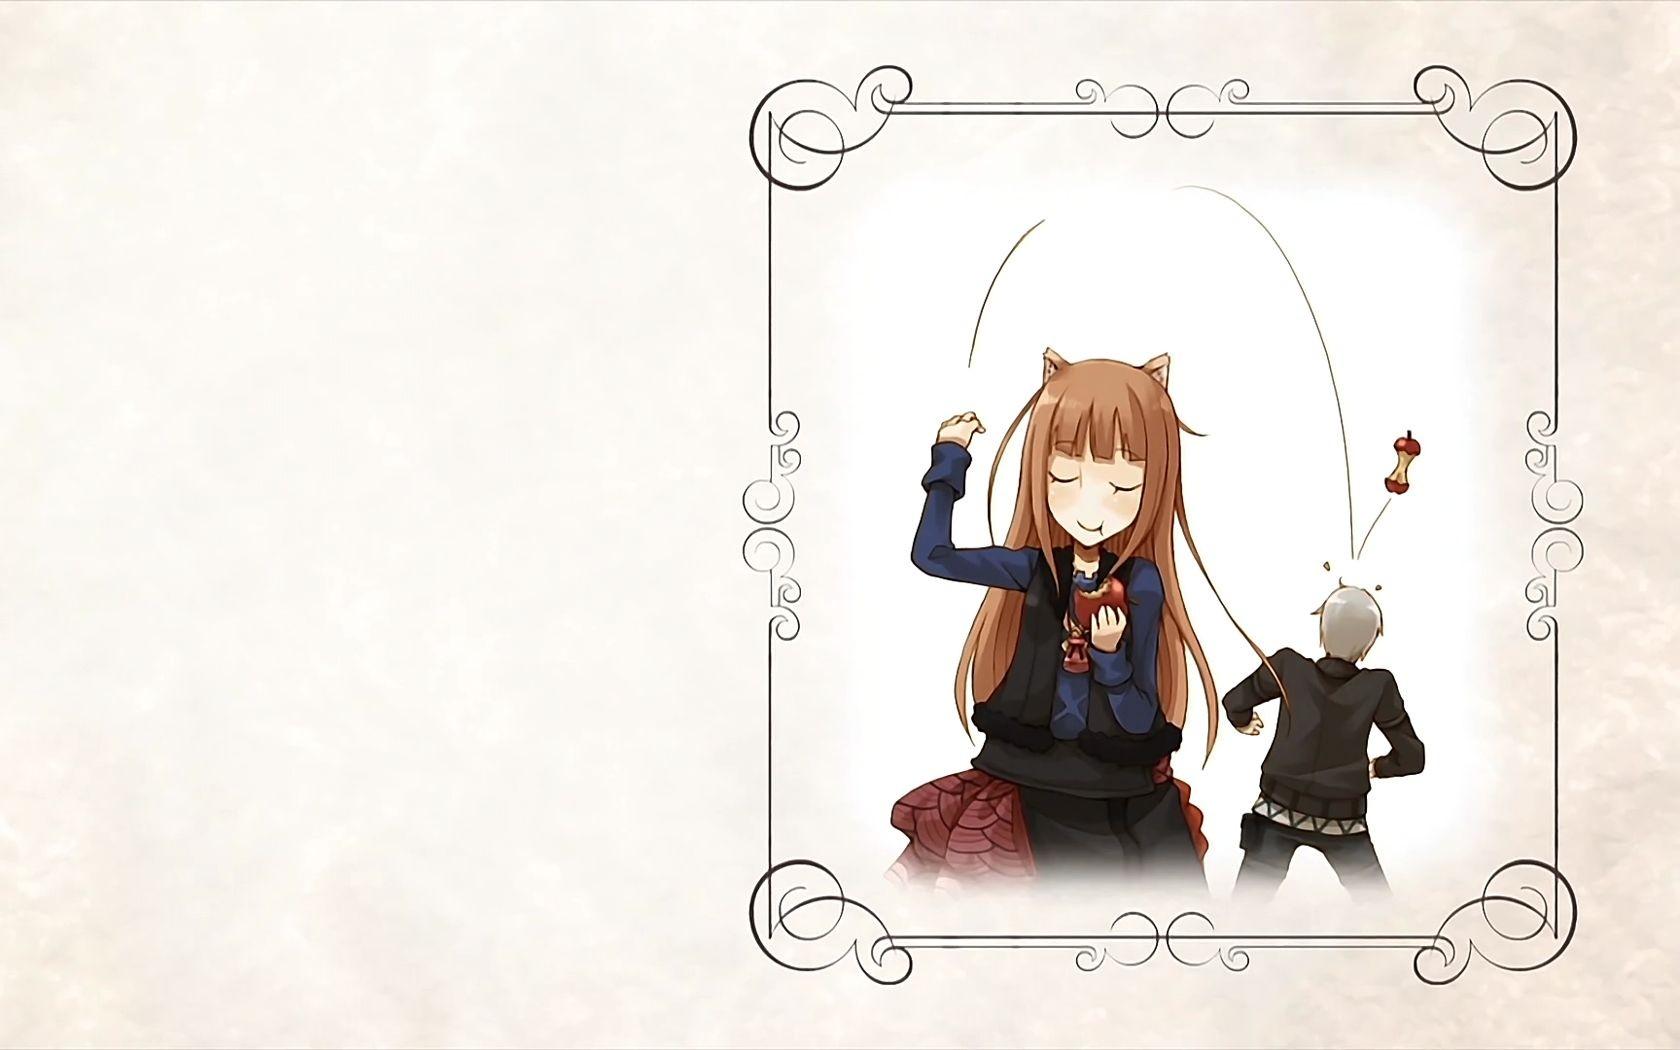 Wallpaper Ilustrasi Gadis Anime Gambar Kartun Apel